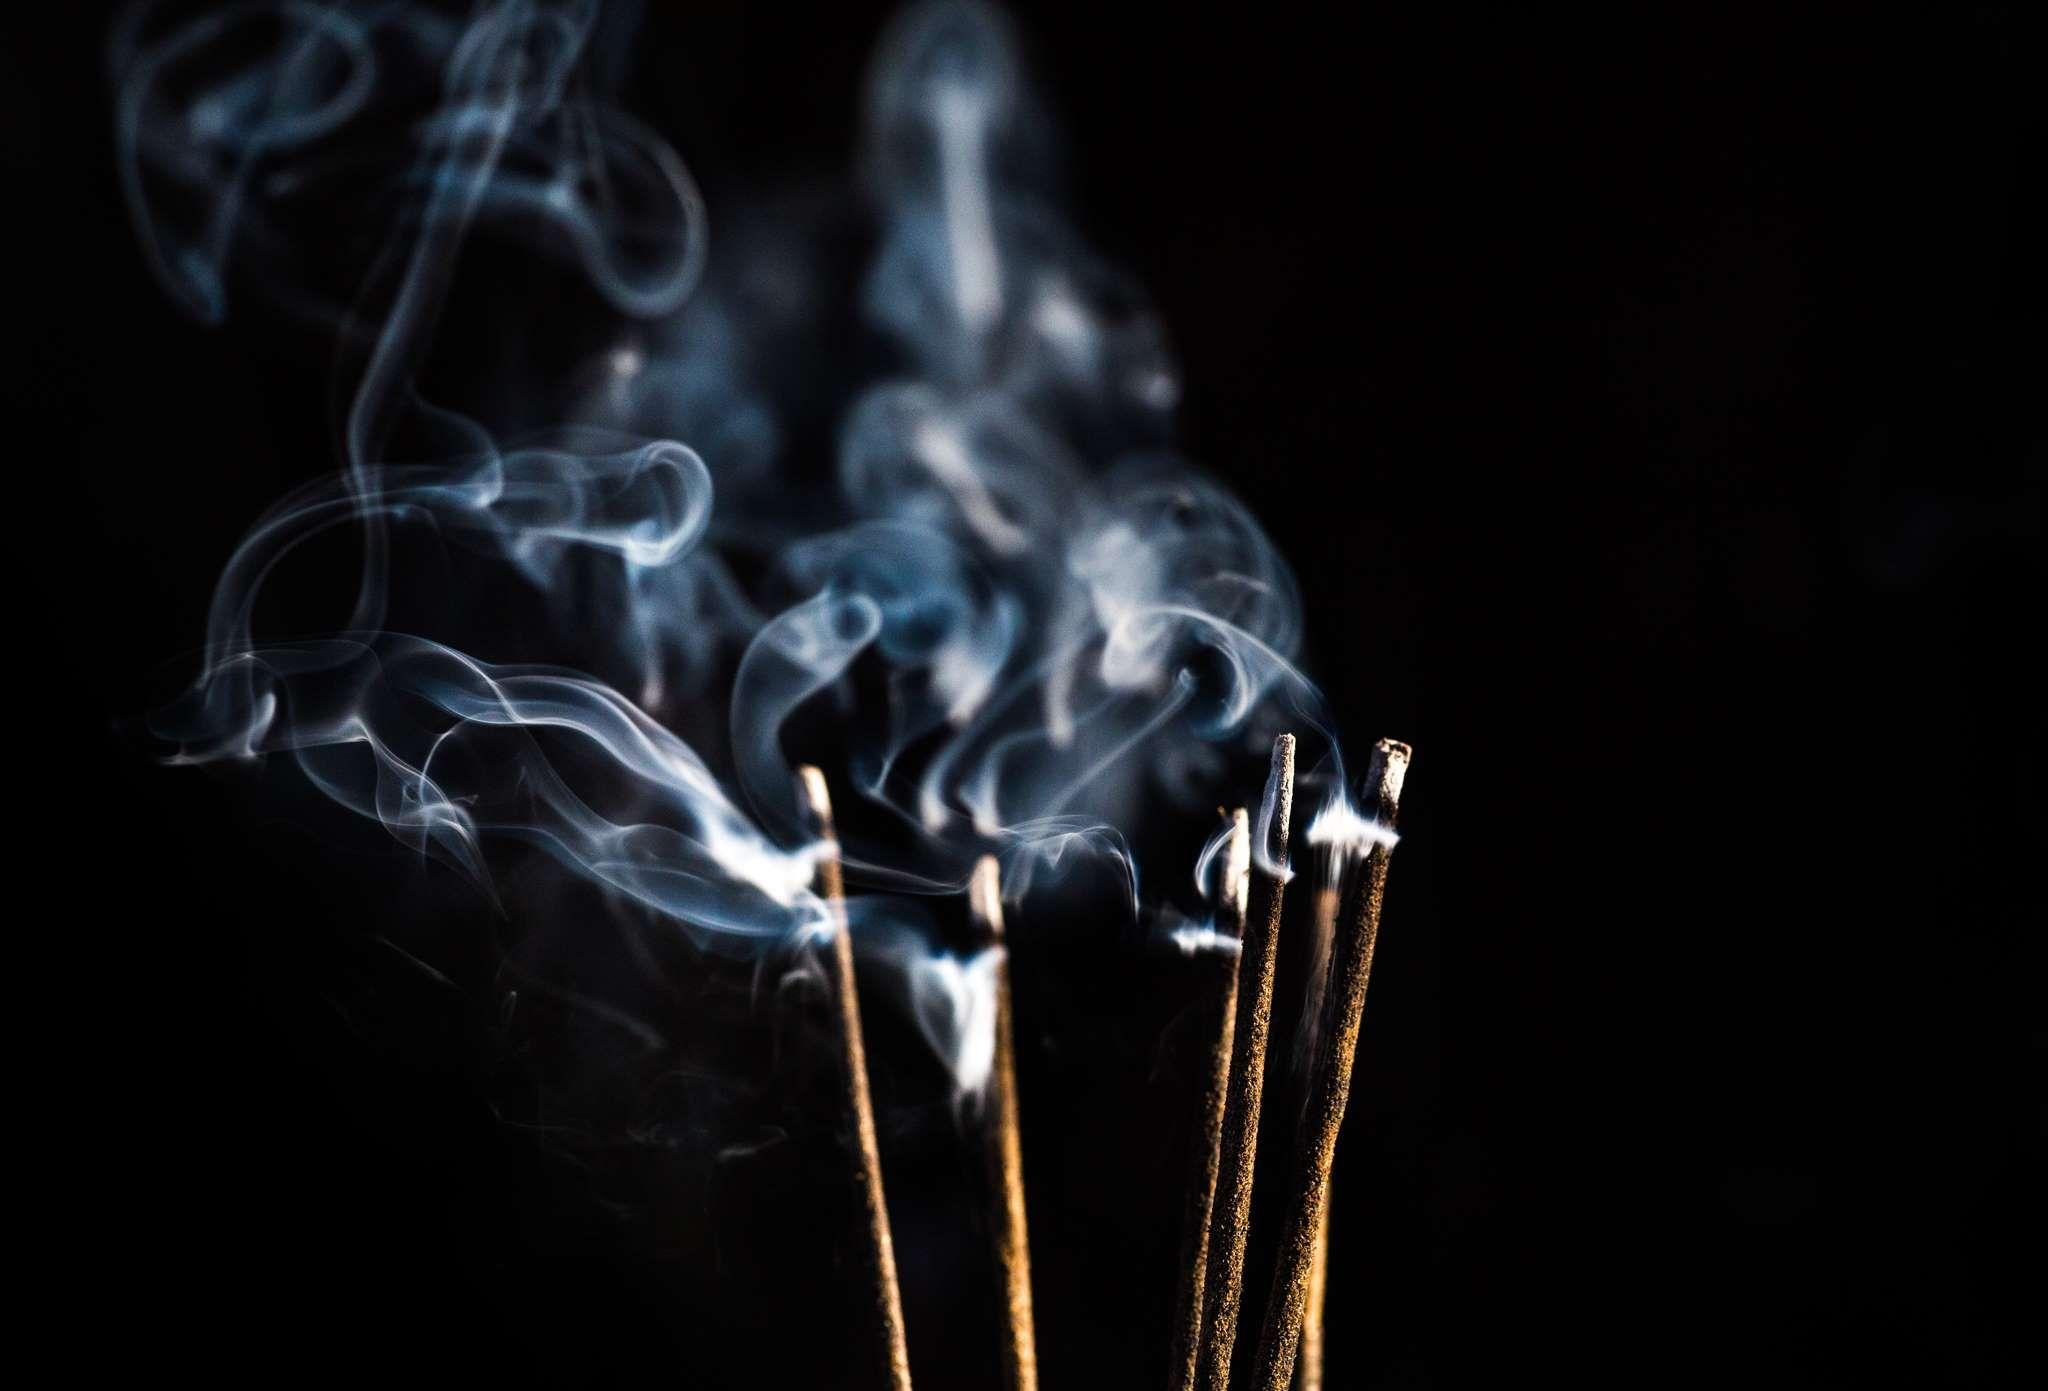 black #buddhism #burn #faith #incense #isolated #joss stick